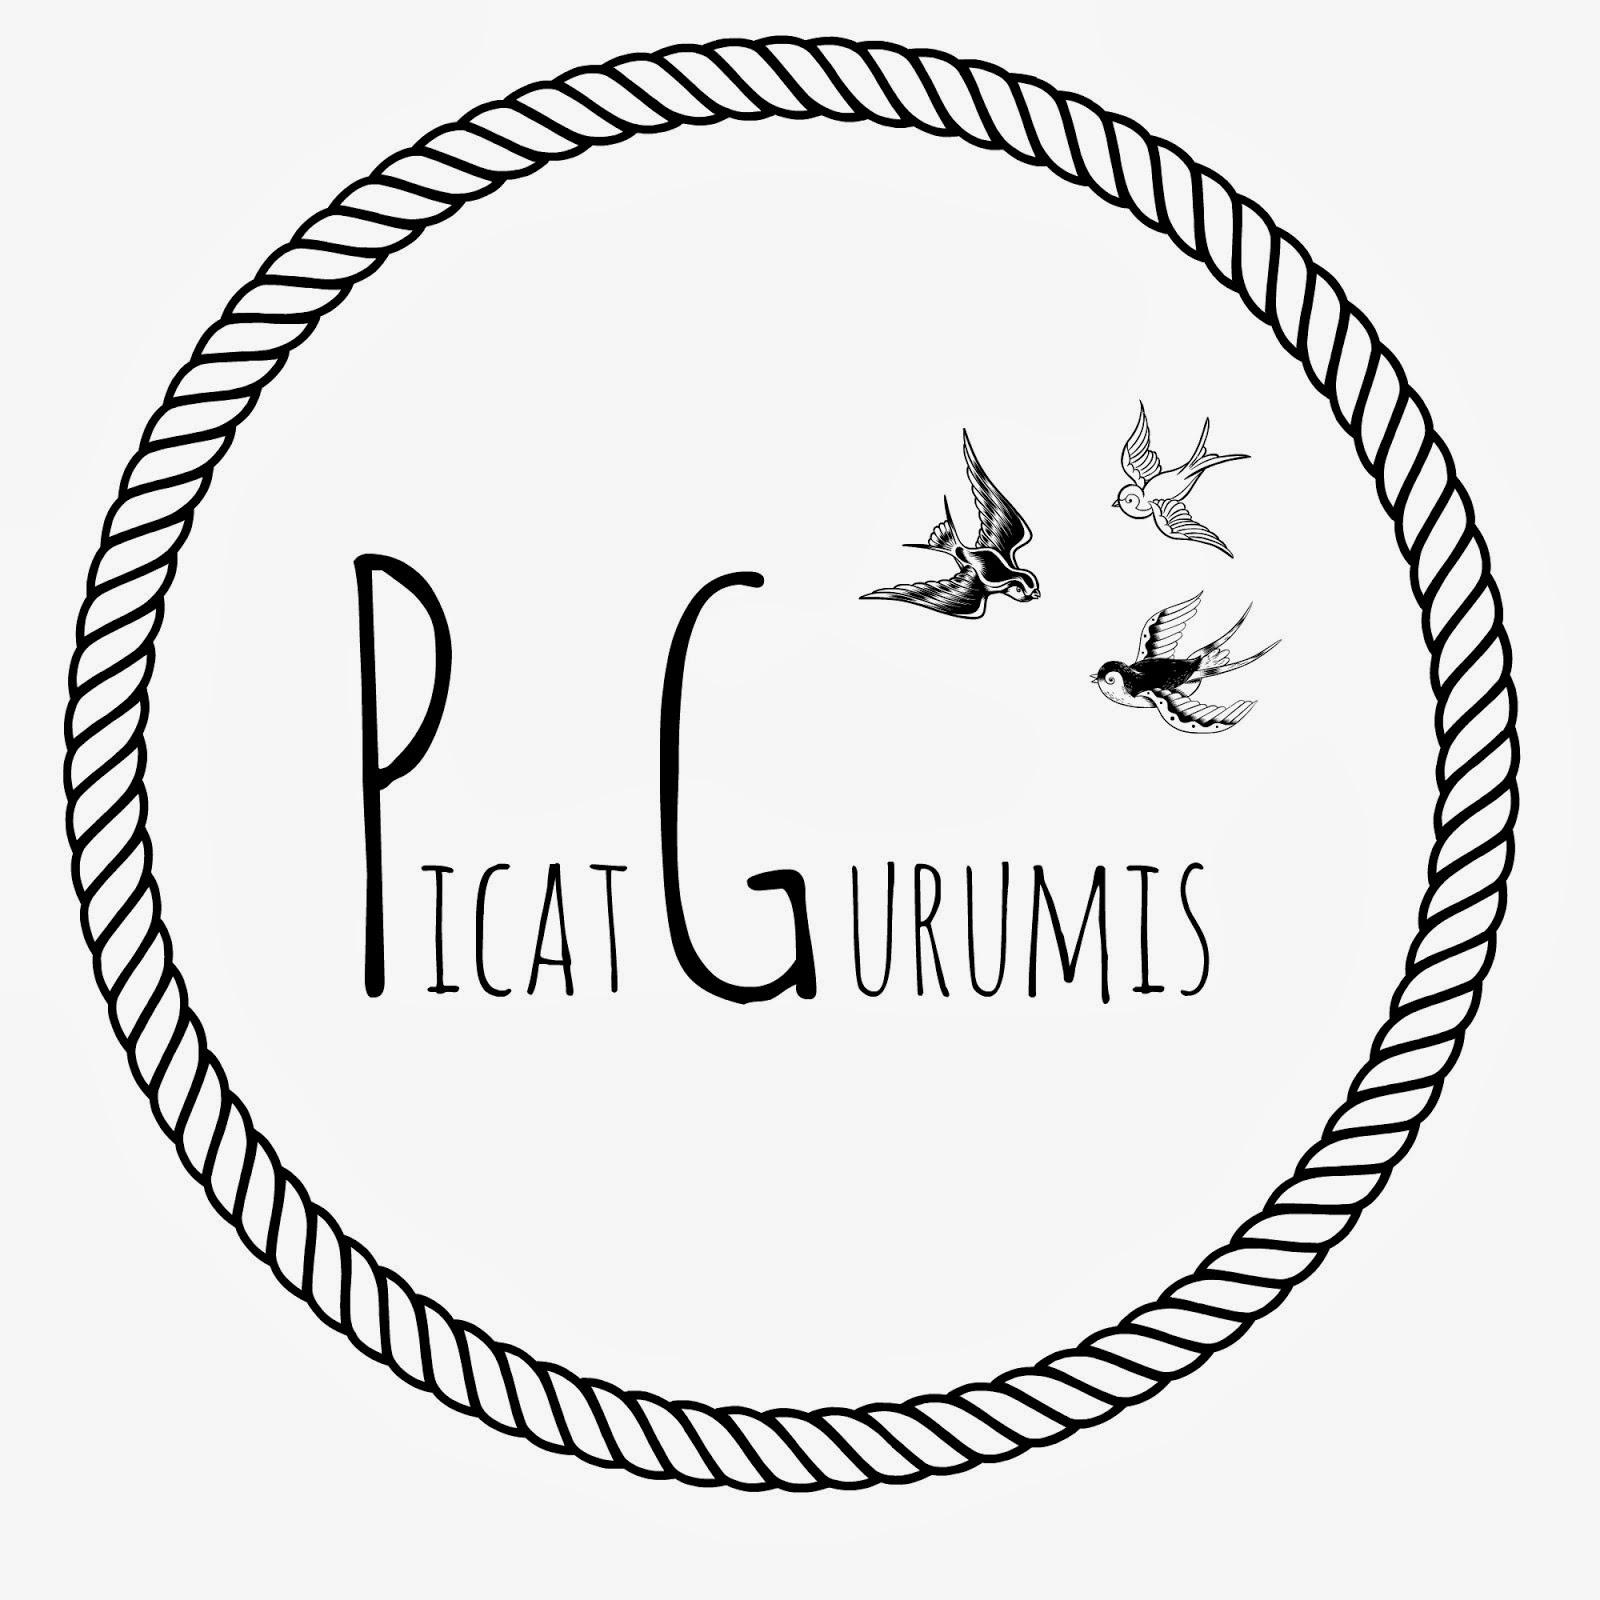 PicatGurumis